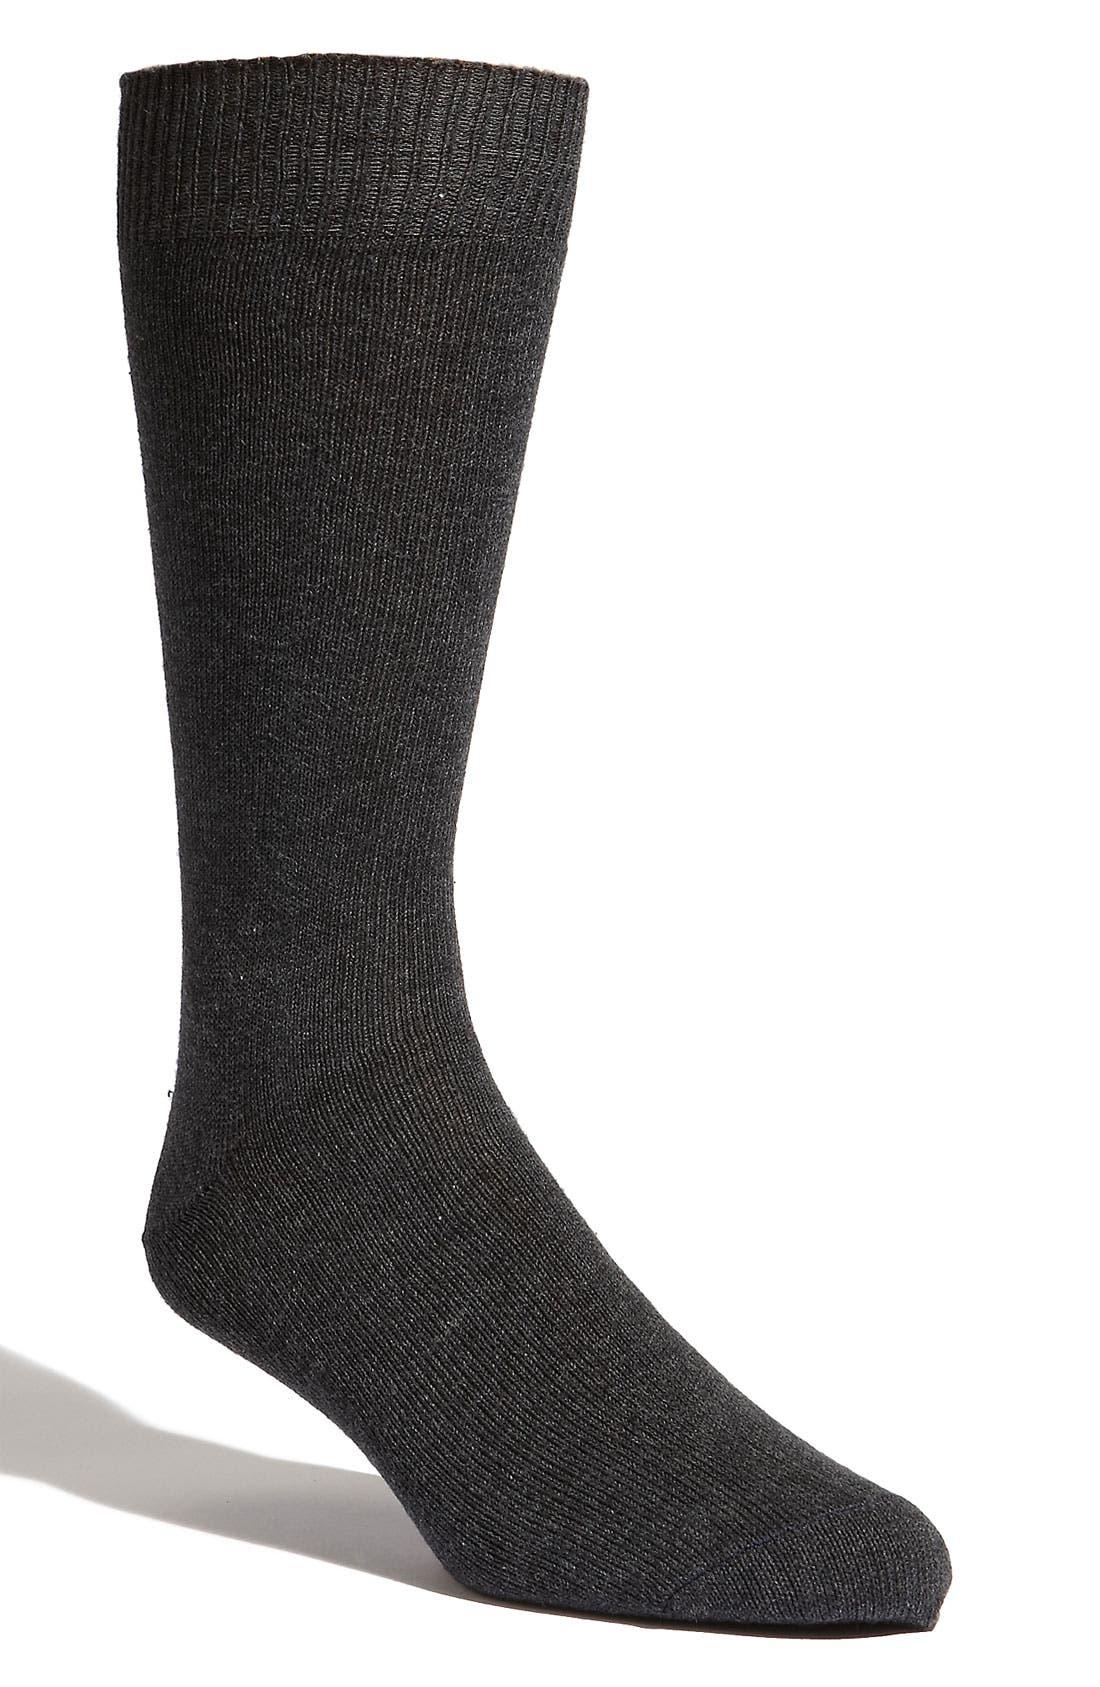 Main Image - Lorenzo Uomo 'Giza' Socks